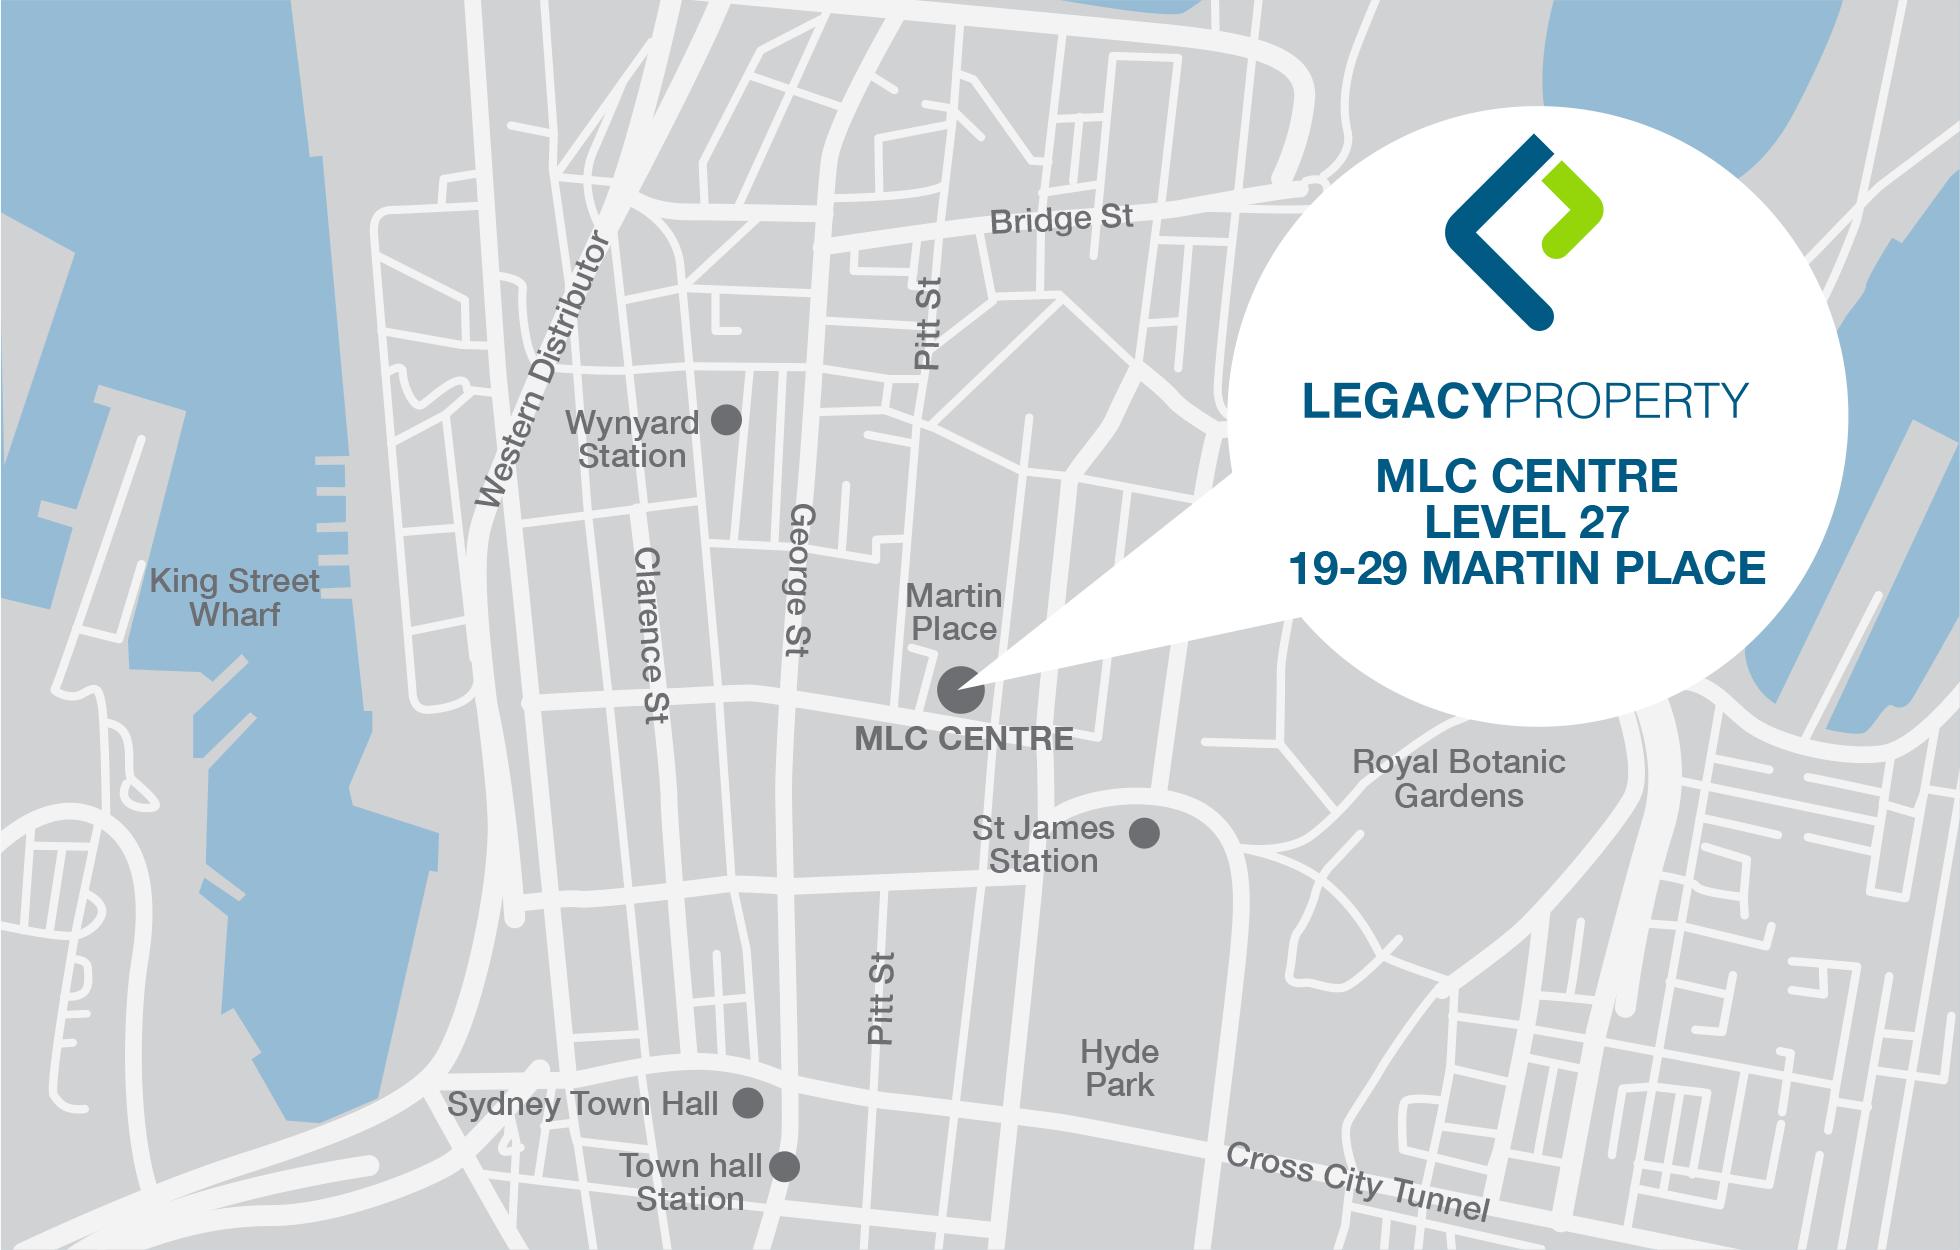 Legacy Property Map